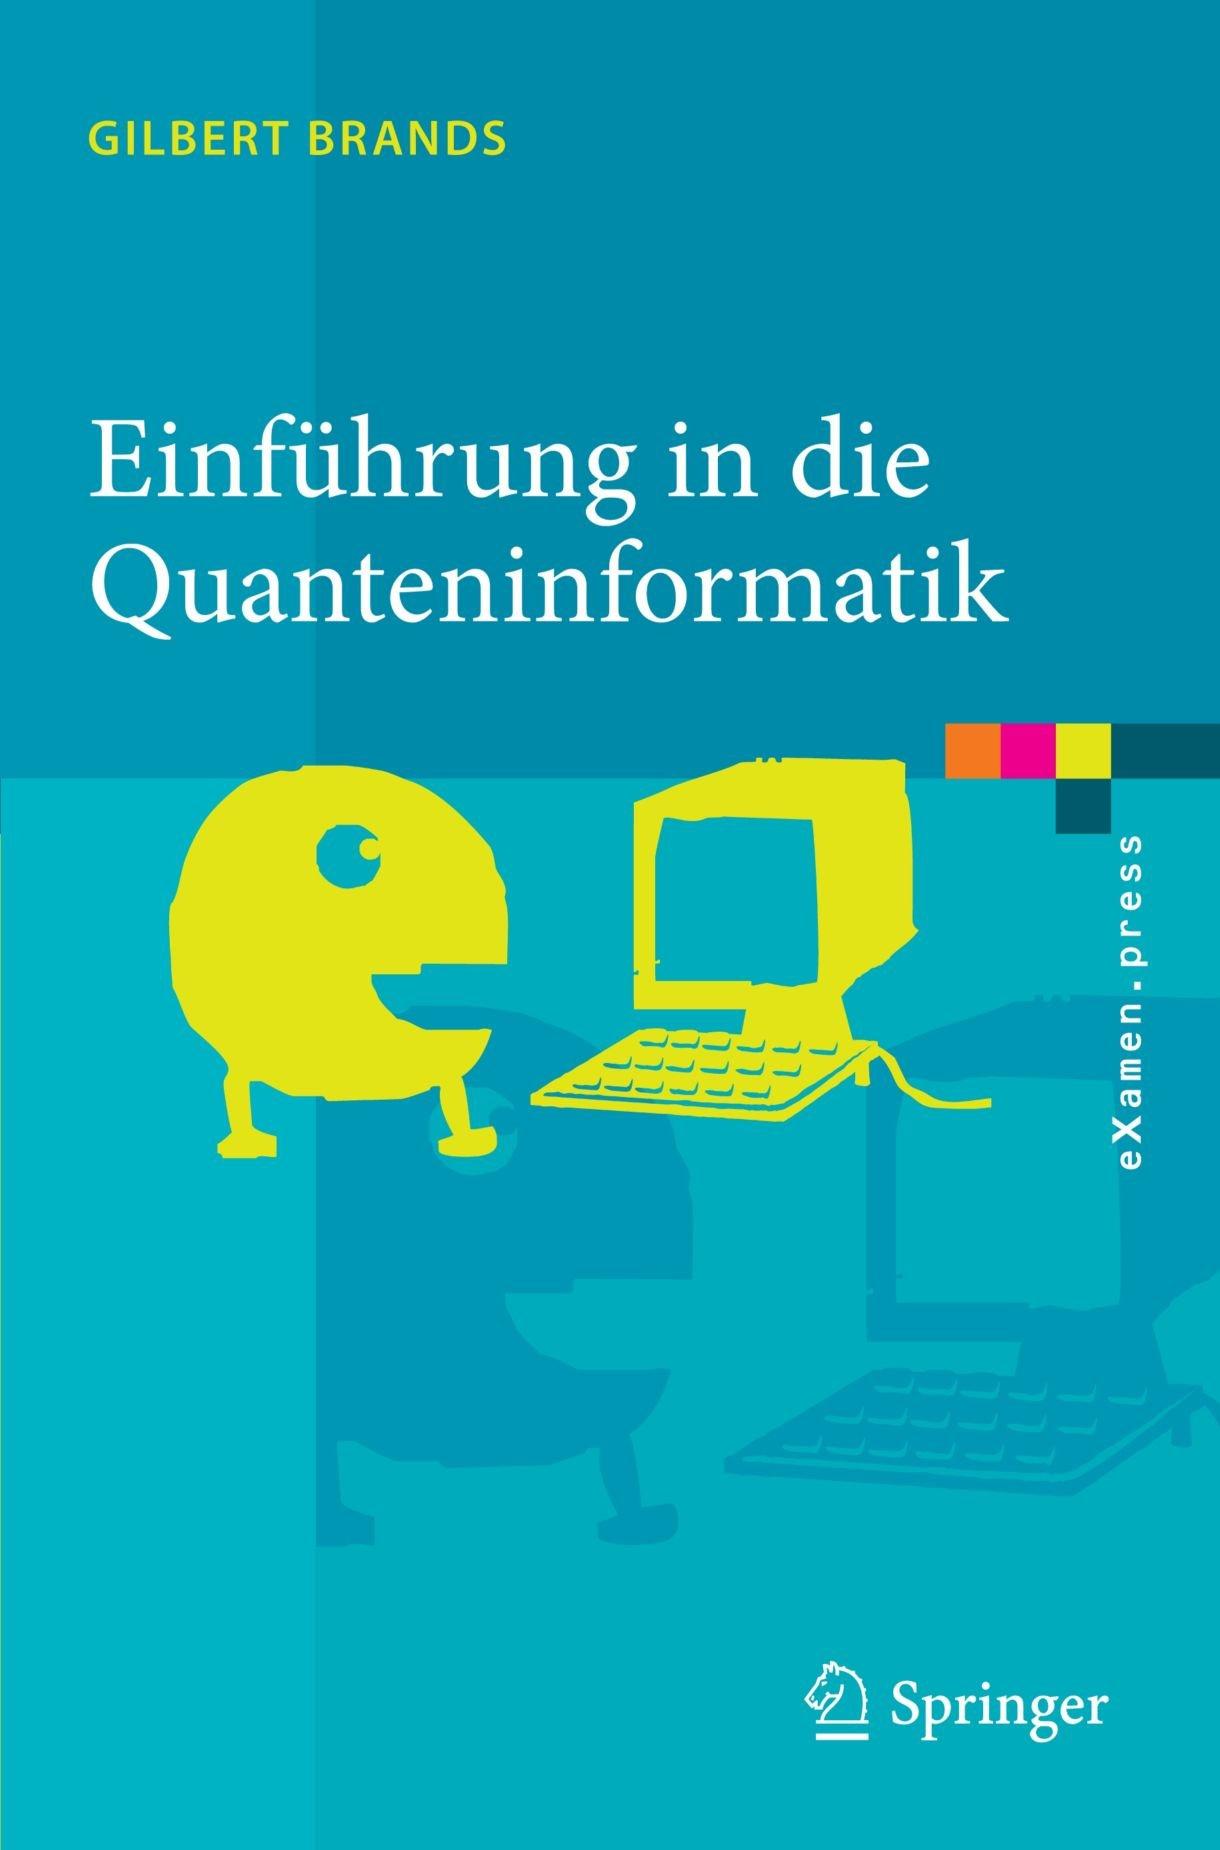 Einführung in die Quanteninformatik: Quantenkryptografie, Teleportation und Quantencomputing (eXamen.press) (German Edition)